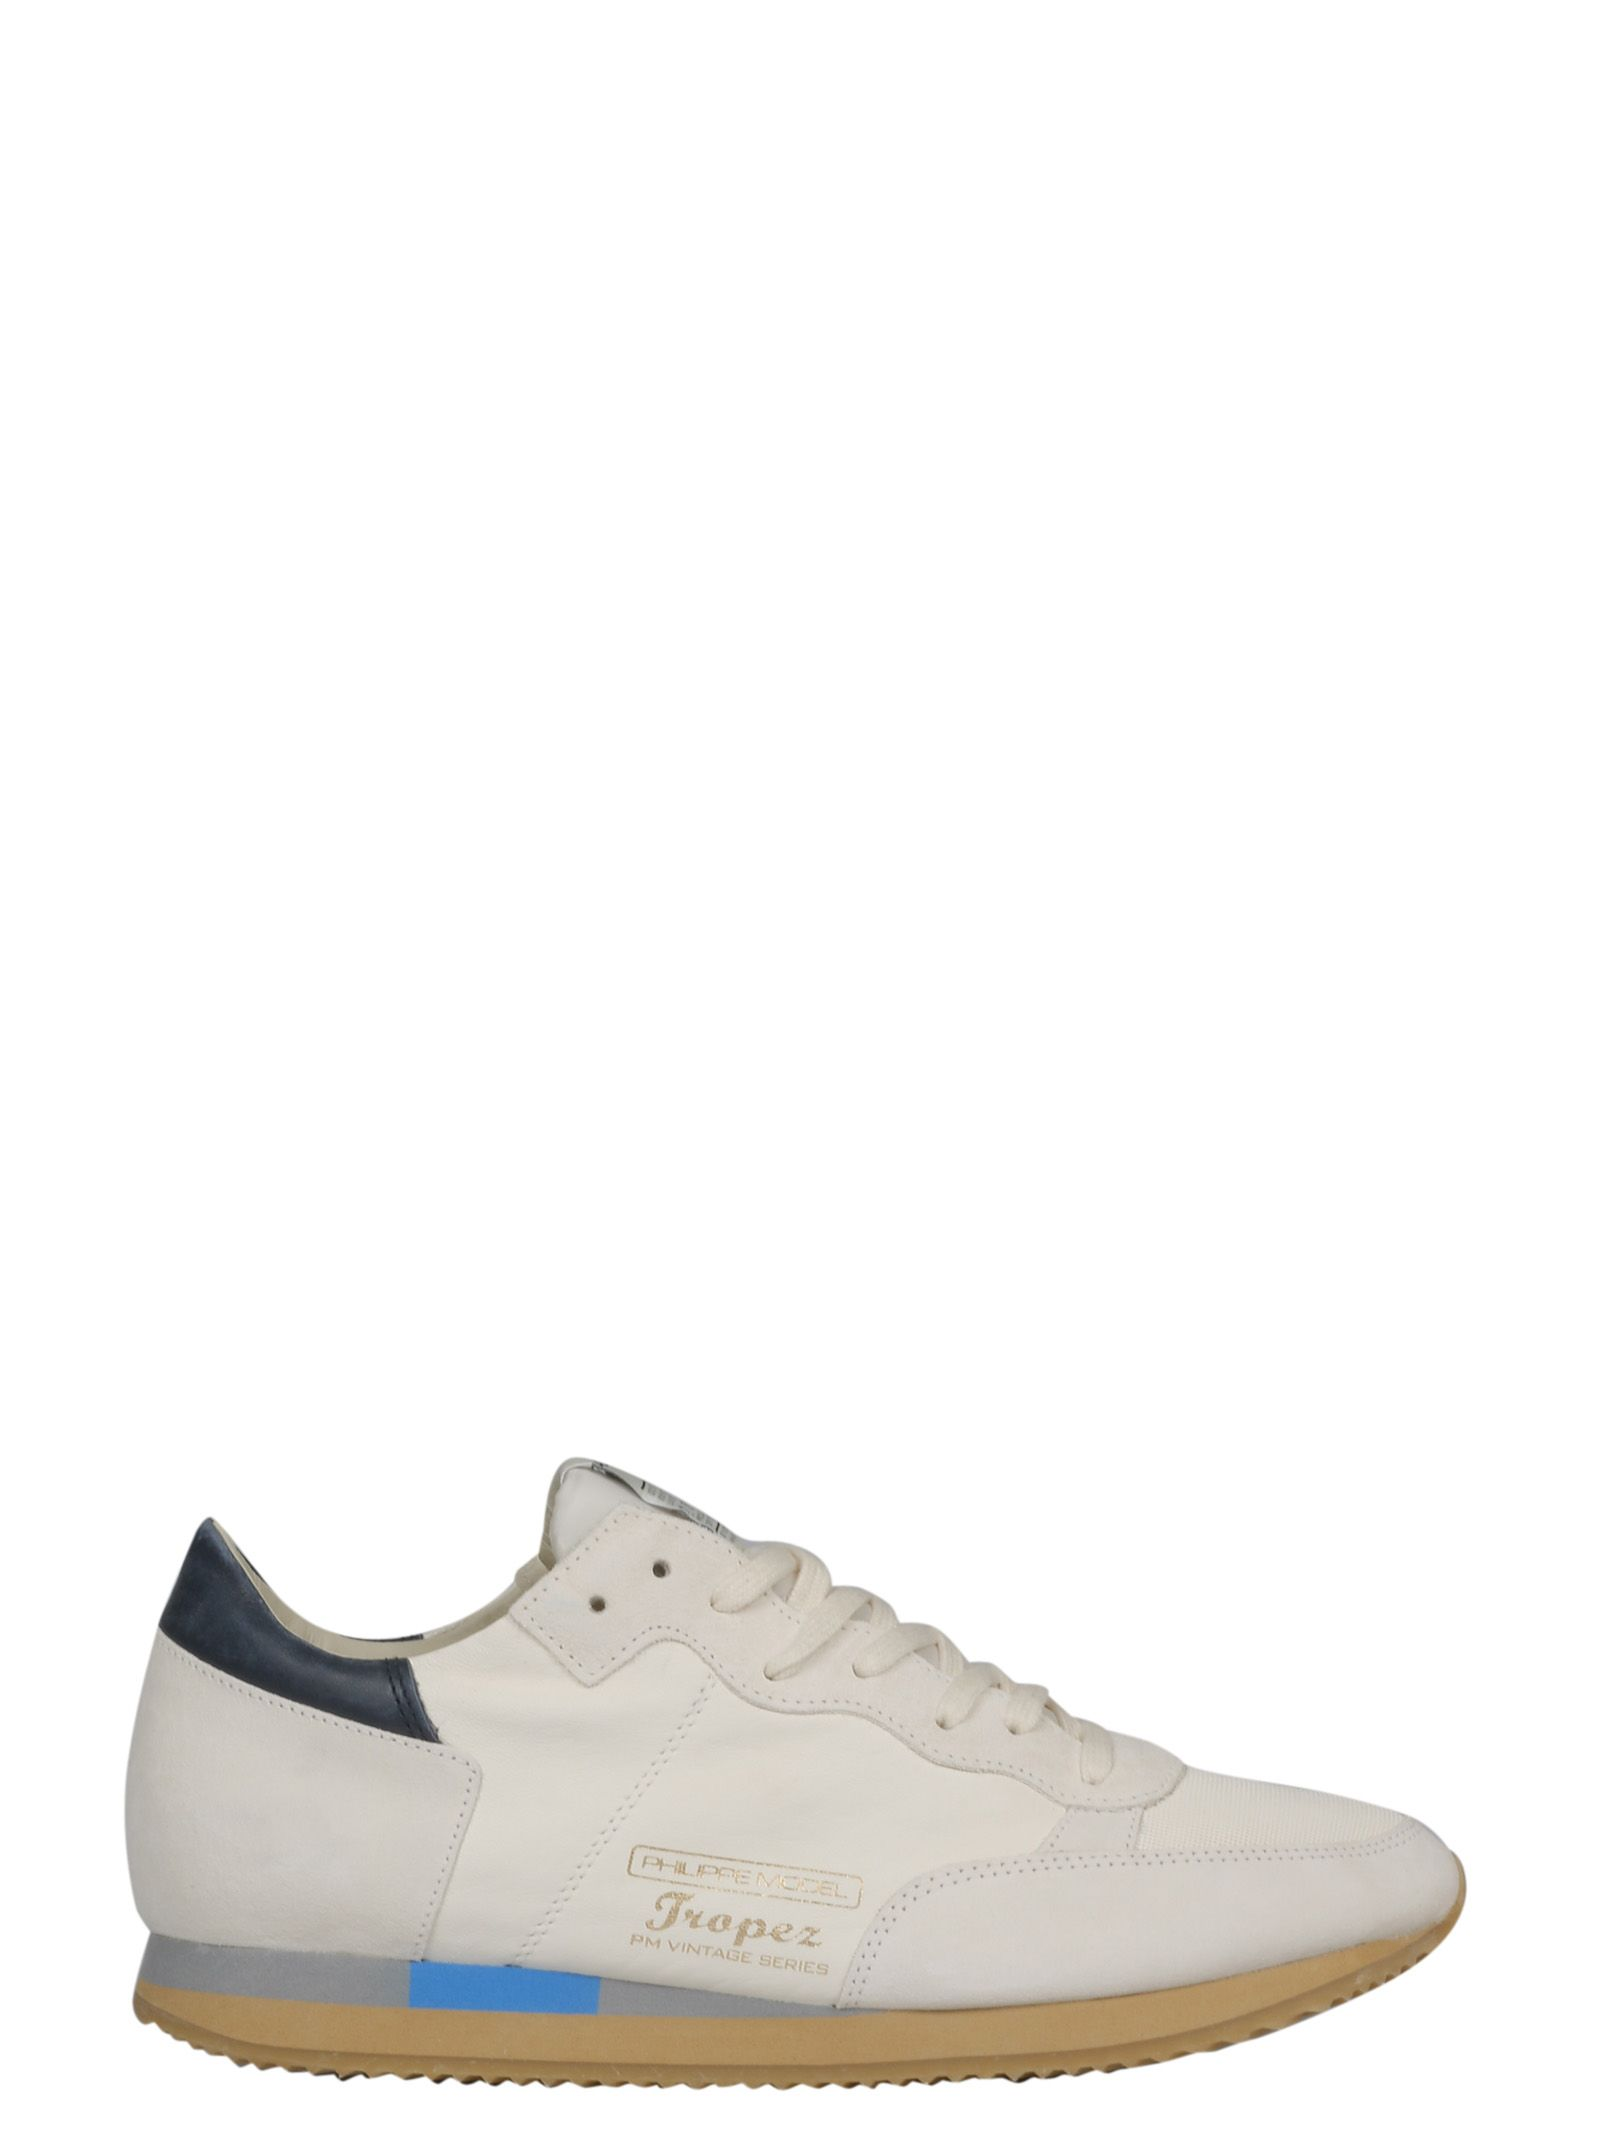 Philippe Model Tropez Vintage Sneakers